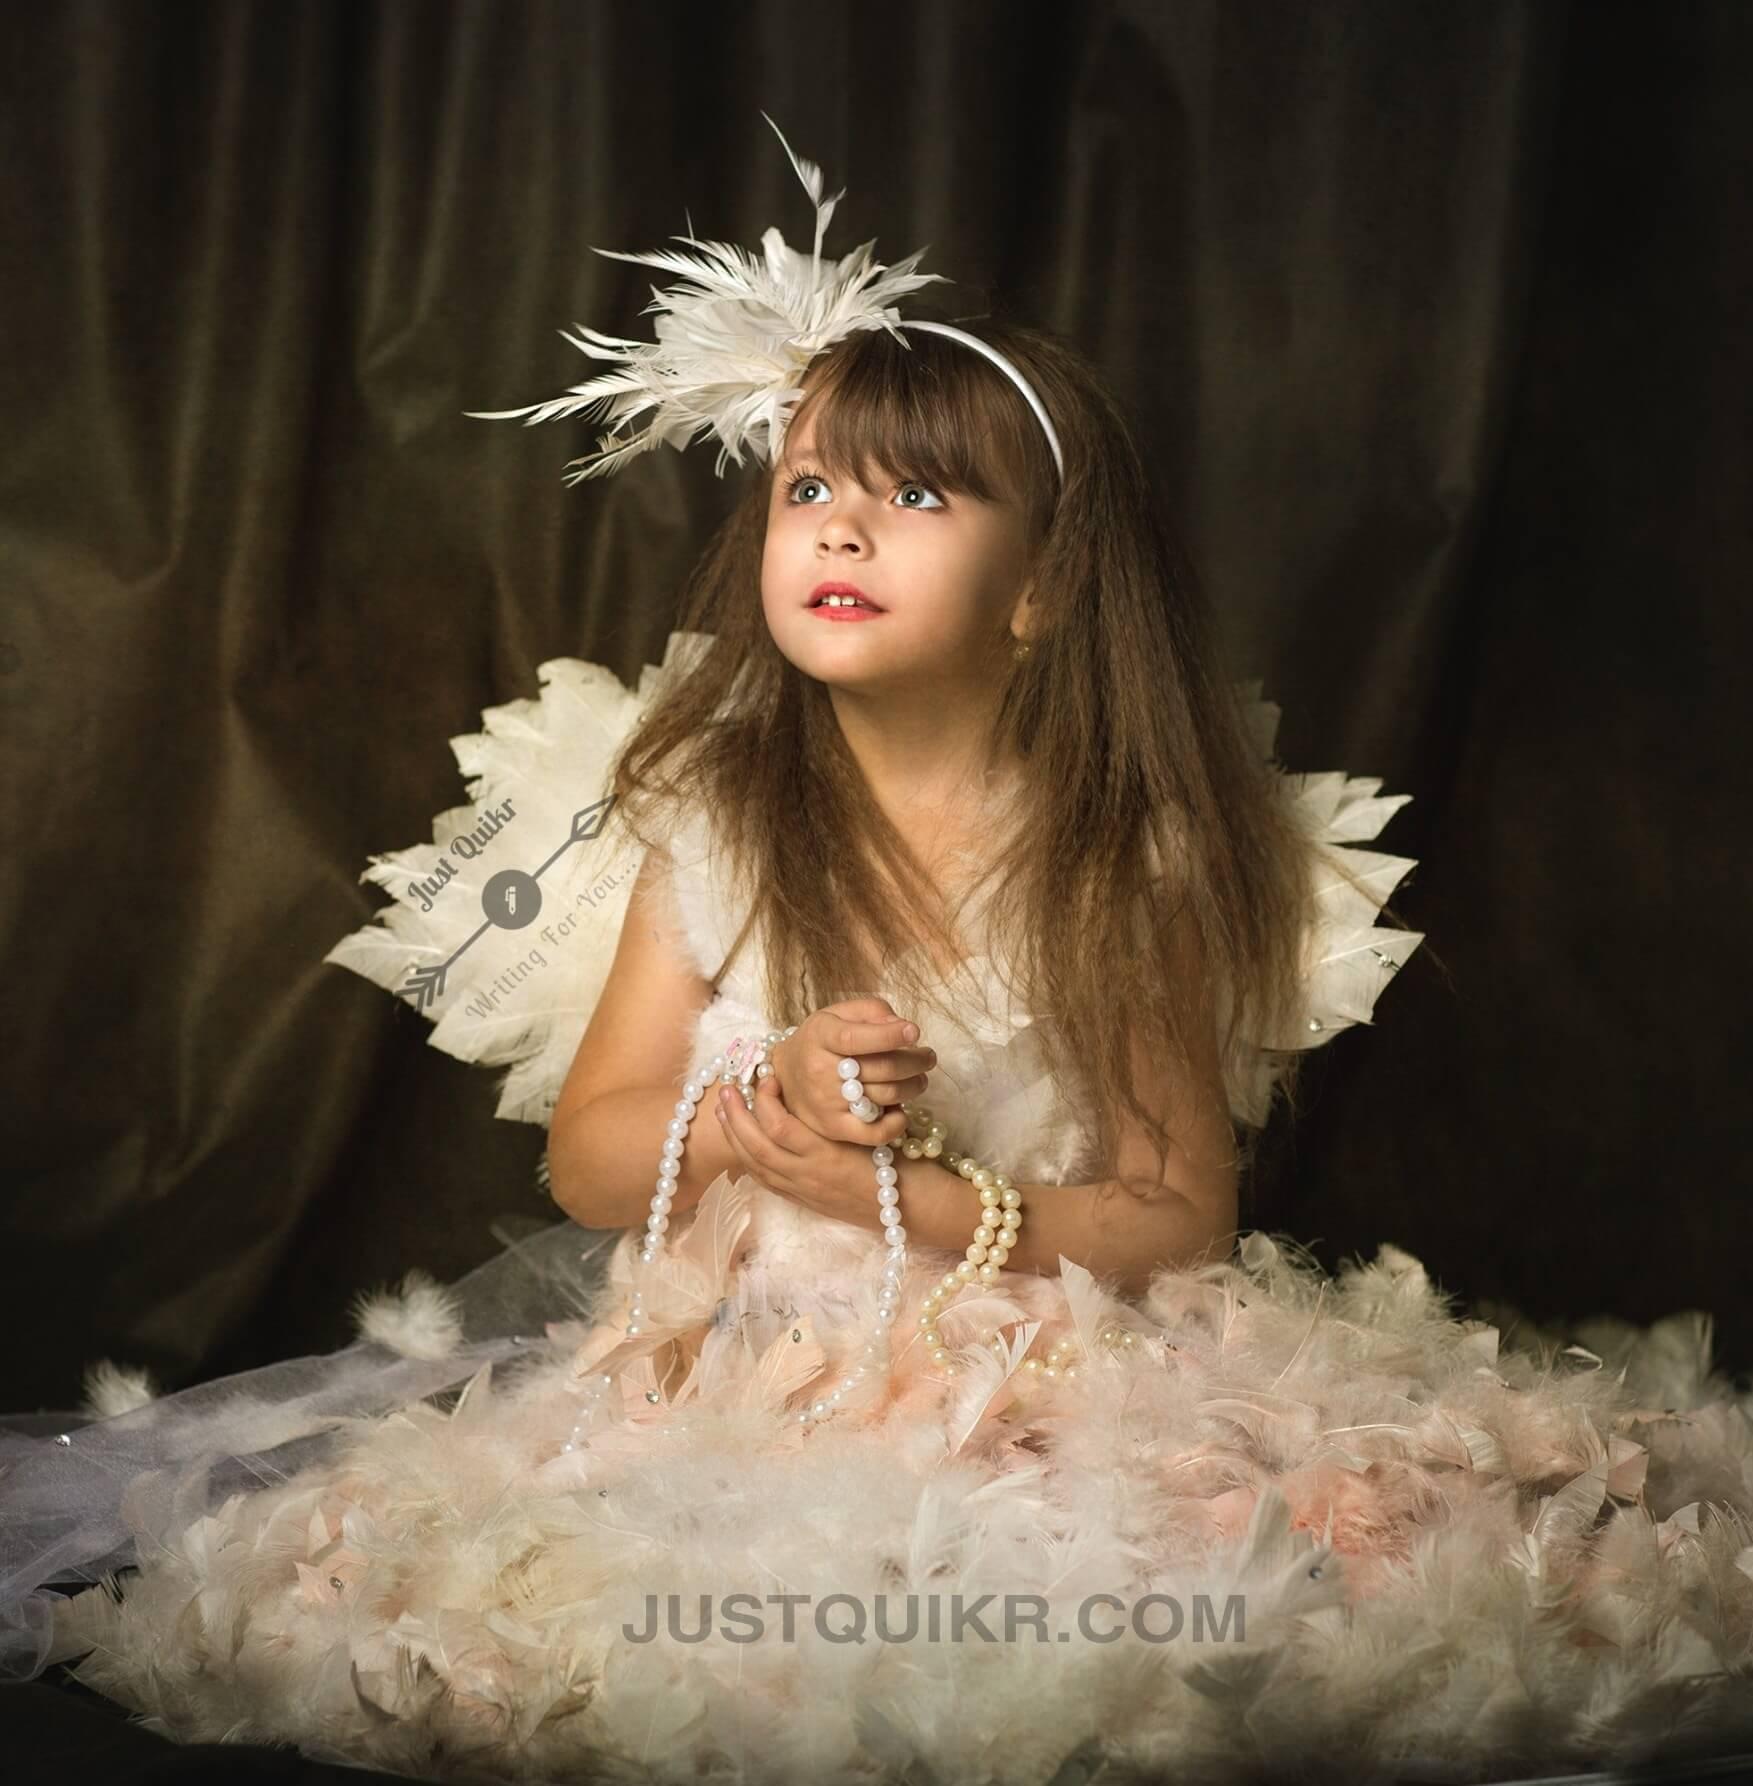 Creative Happy Birthday Wishing Cake Status Images for Little Princess